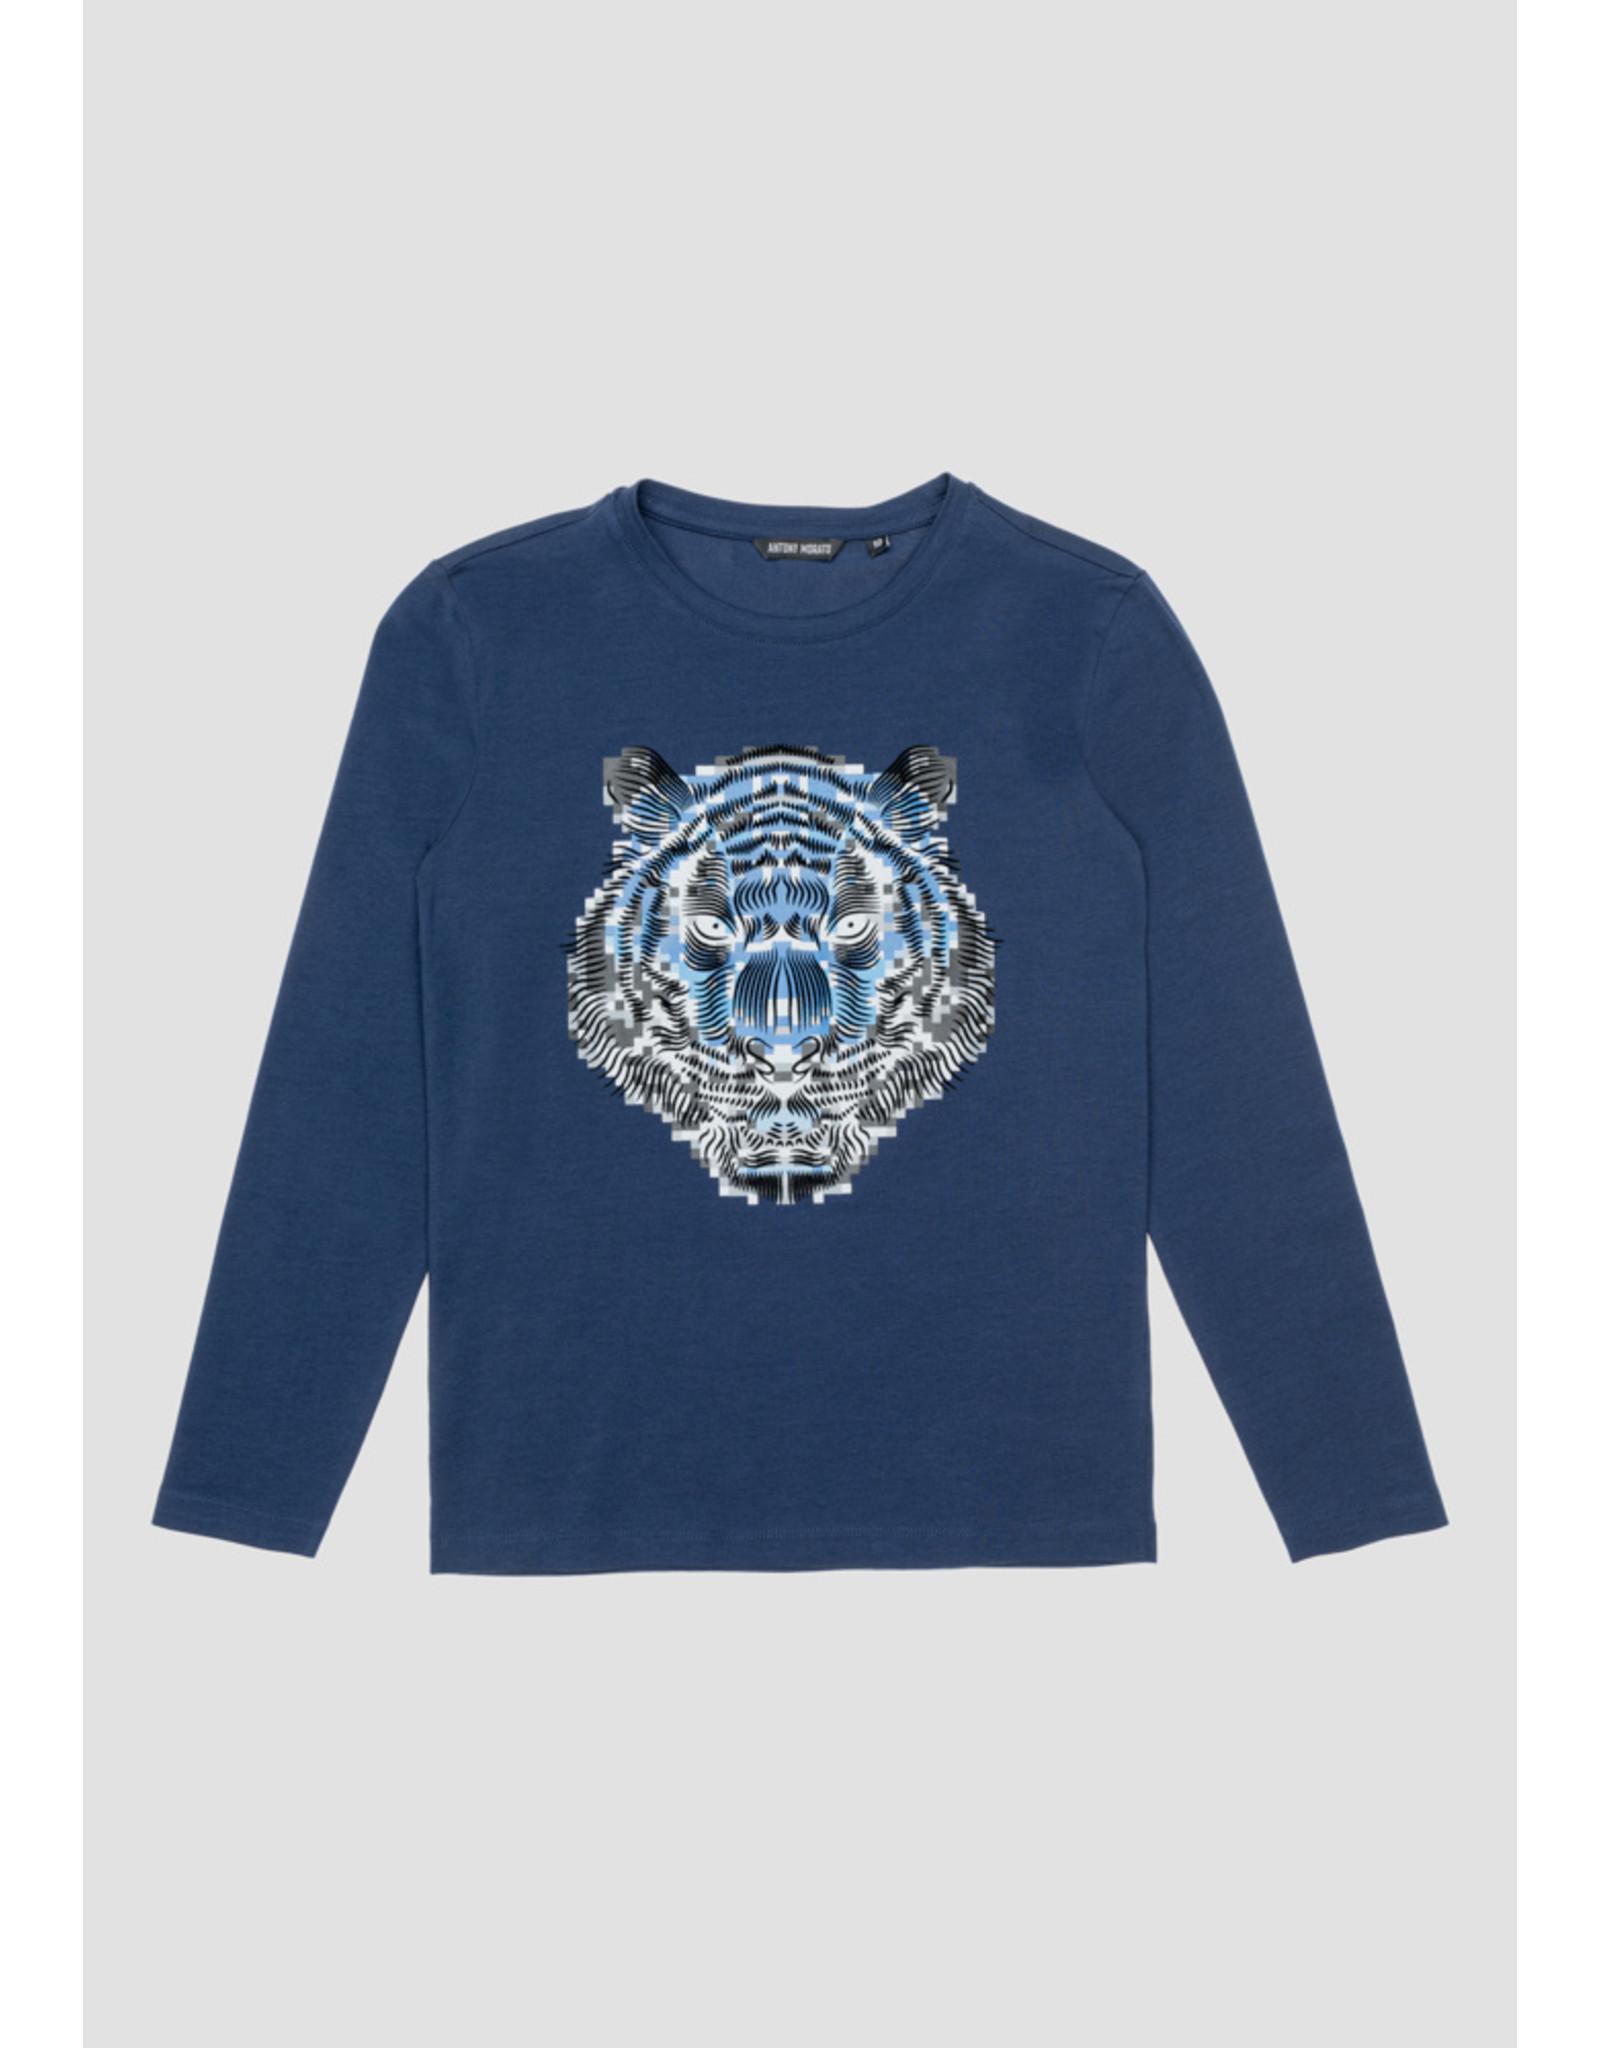 Antony Morato T-shirt marine leeuw